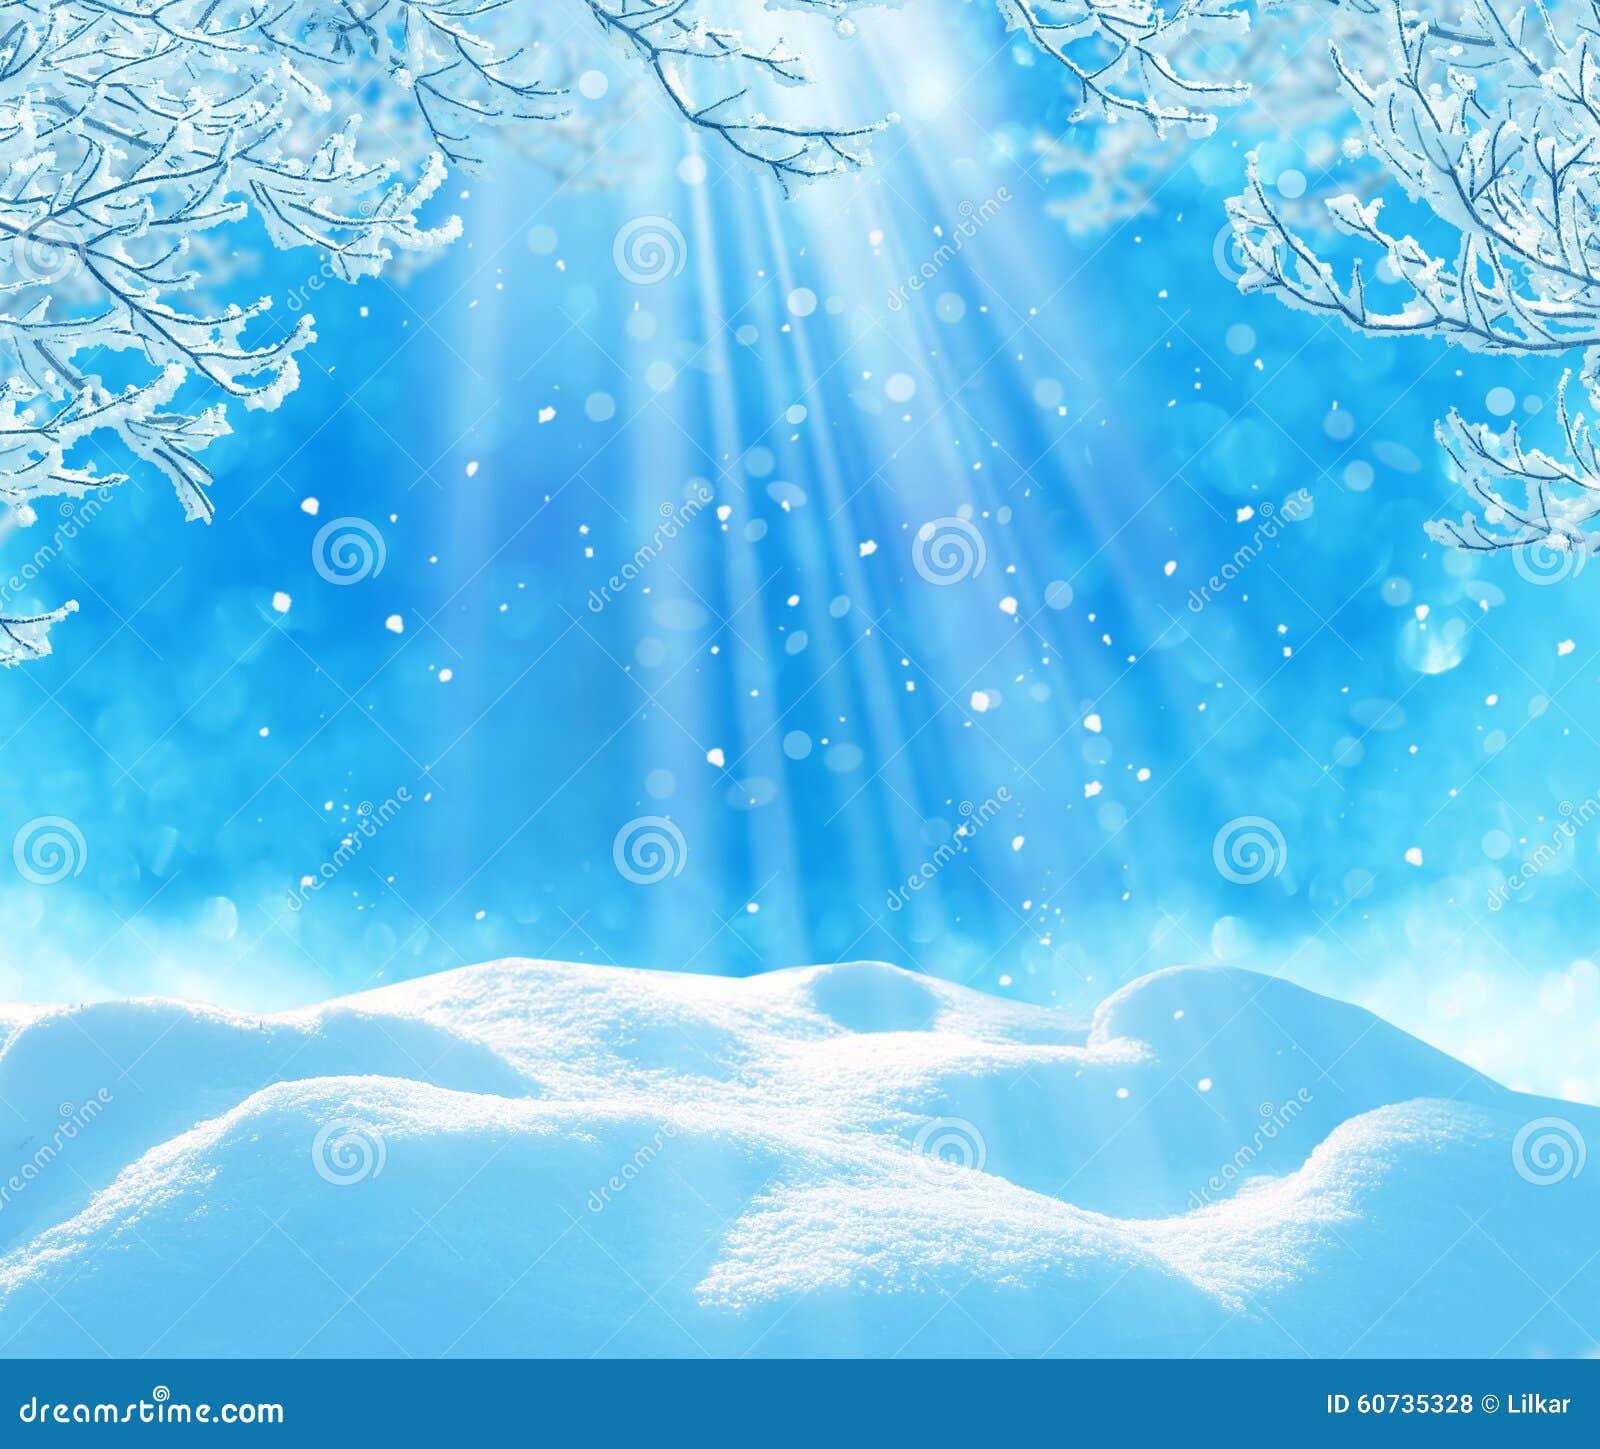 Winter christmas background stock photo image 60735328